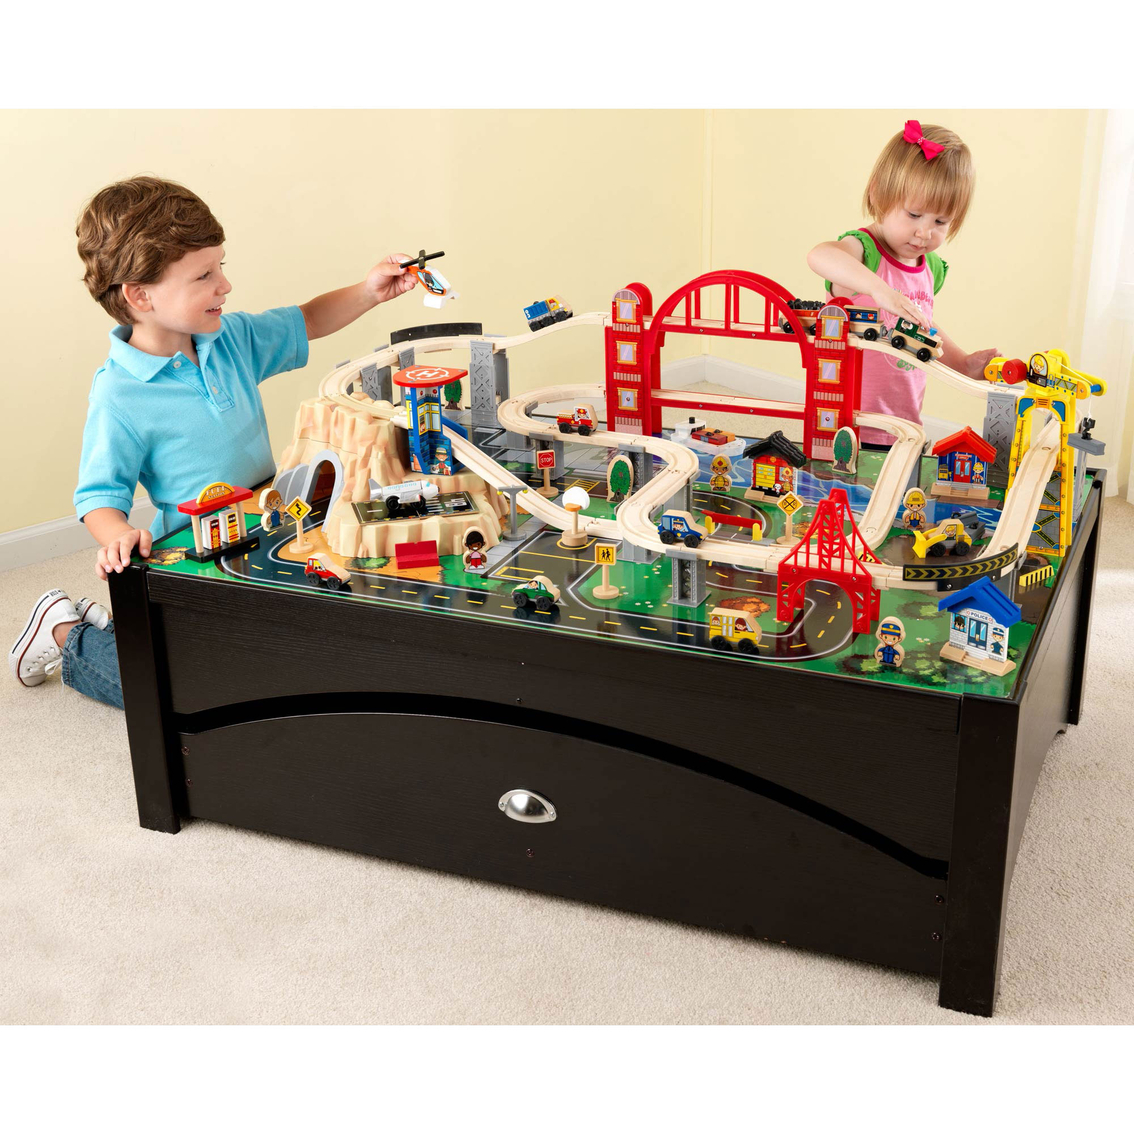 2201  sc 1 st  ShopMyExchange.com & Kidkraft Metropolis Train Table And Set | Tables \u0026 Sets | Shop The ...